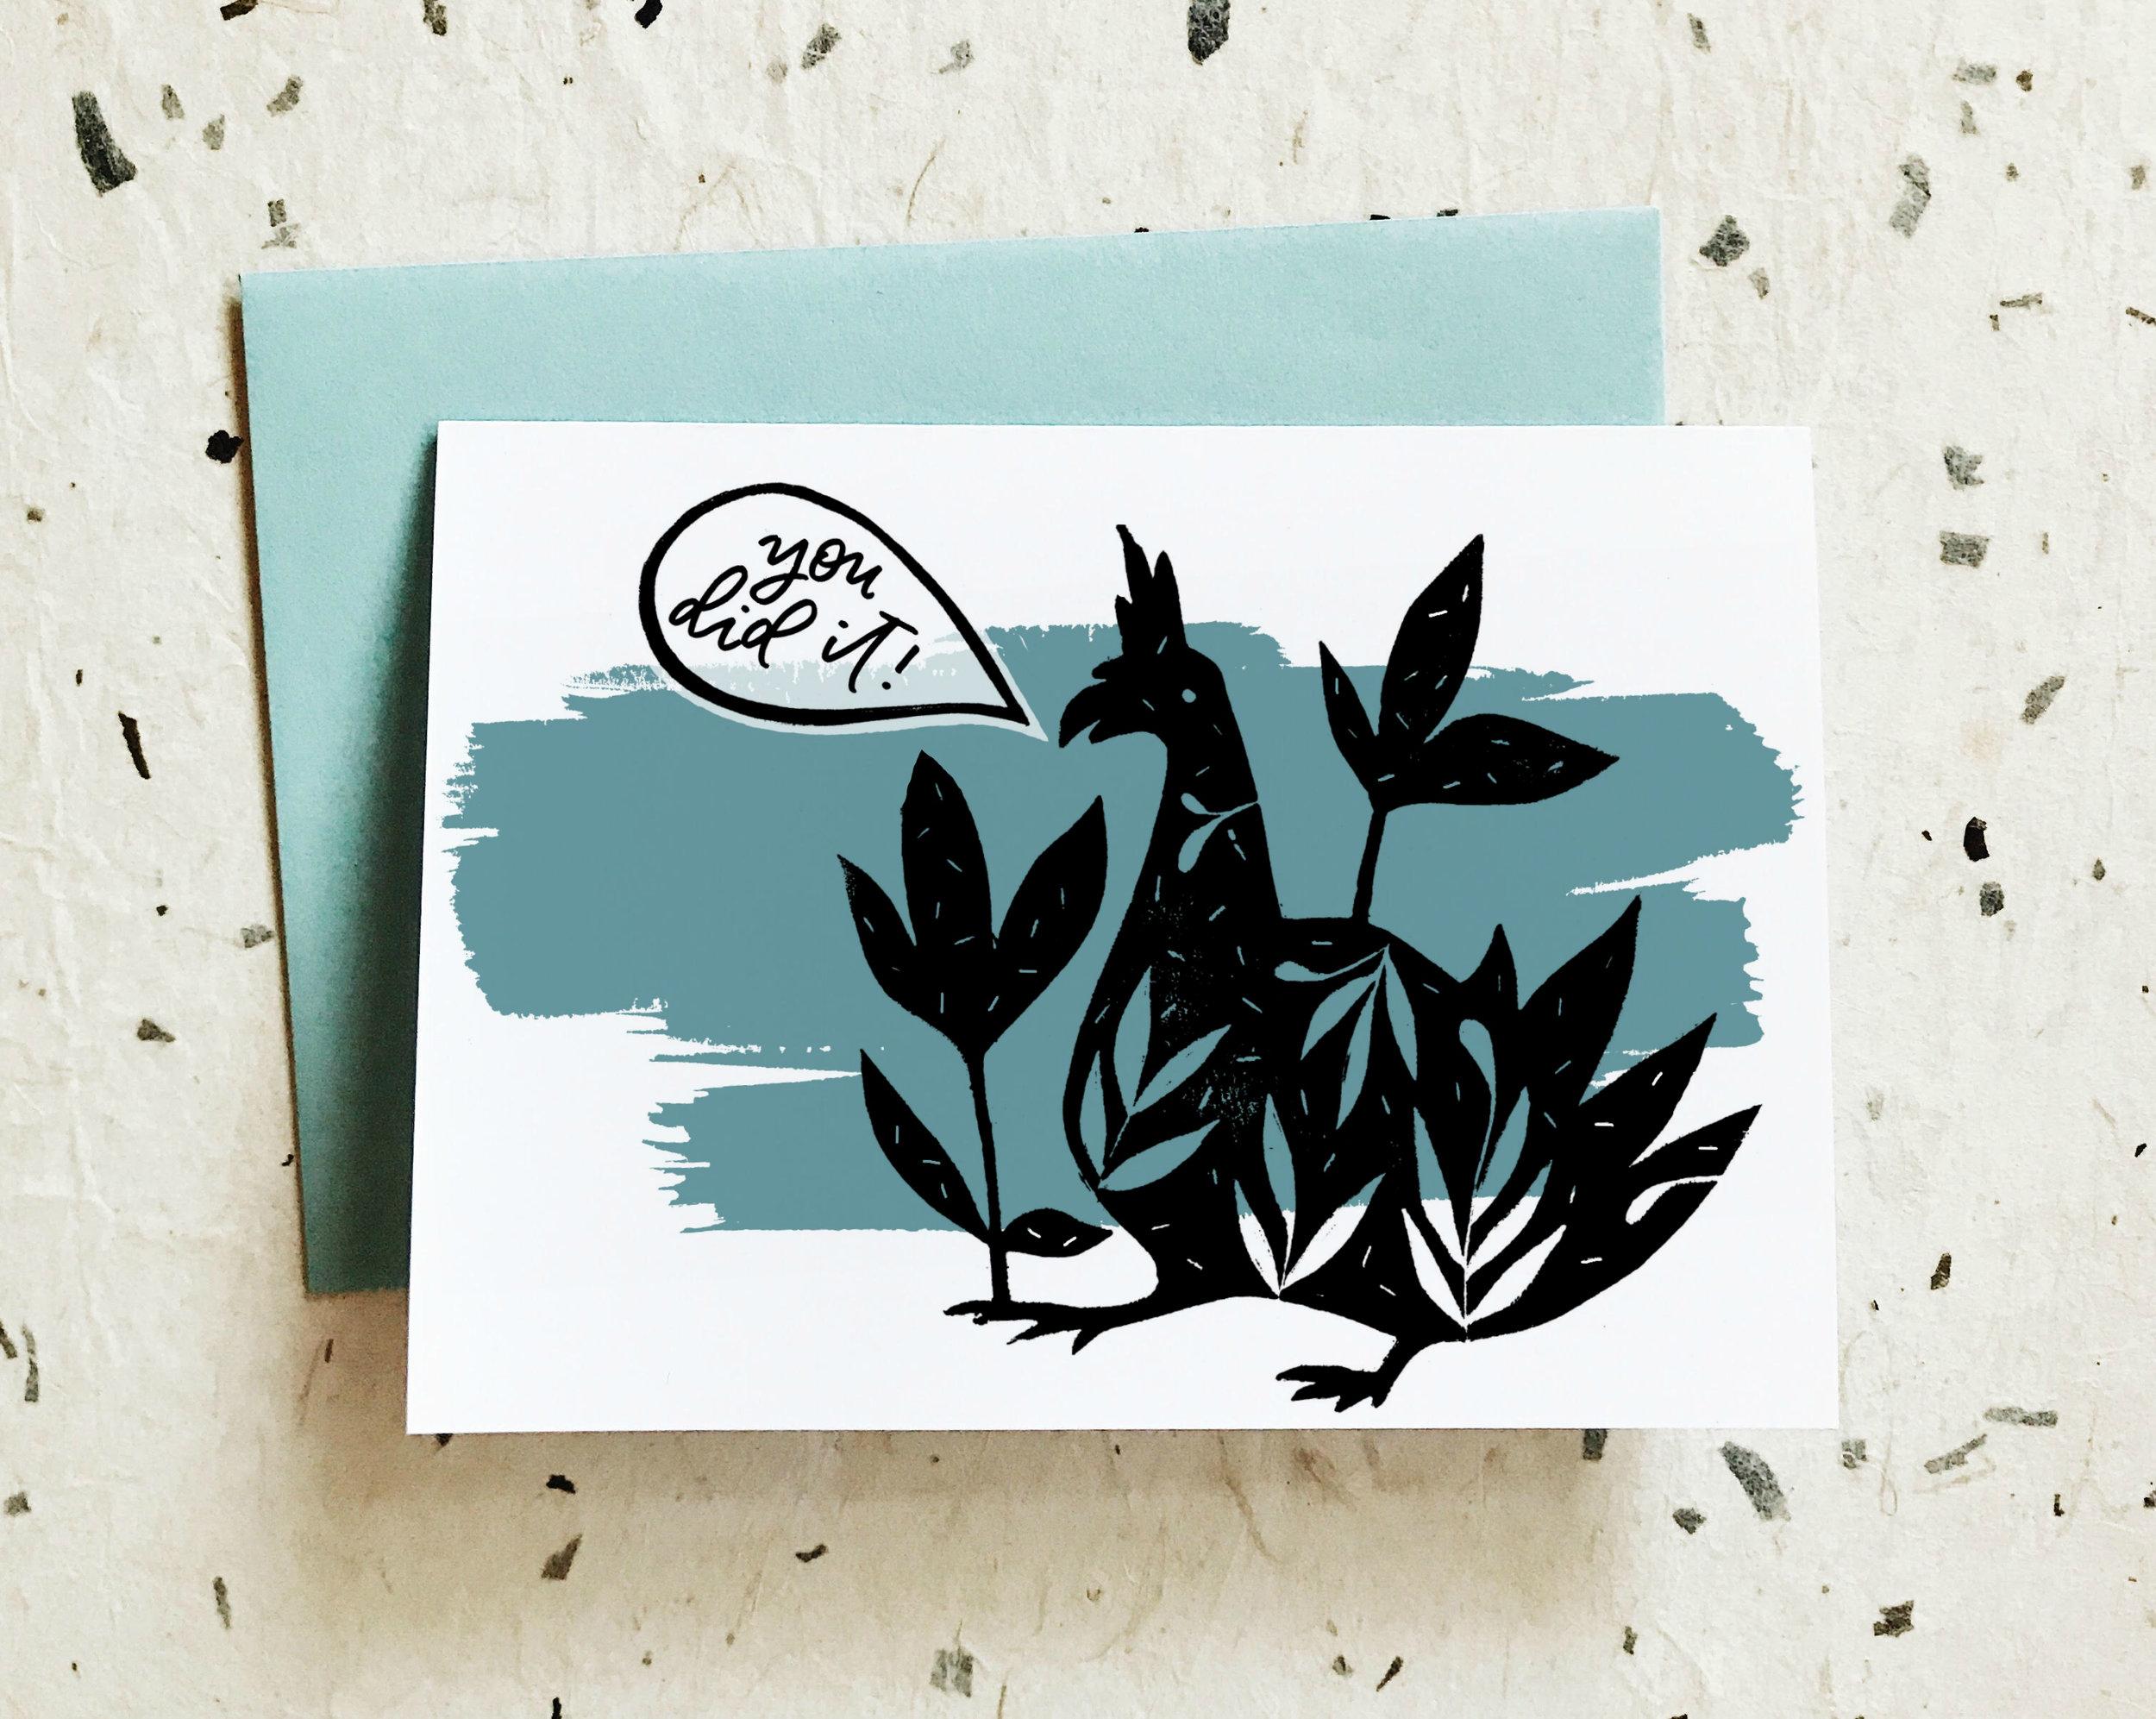 Chicken_Card.jpg